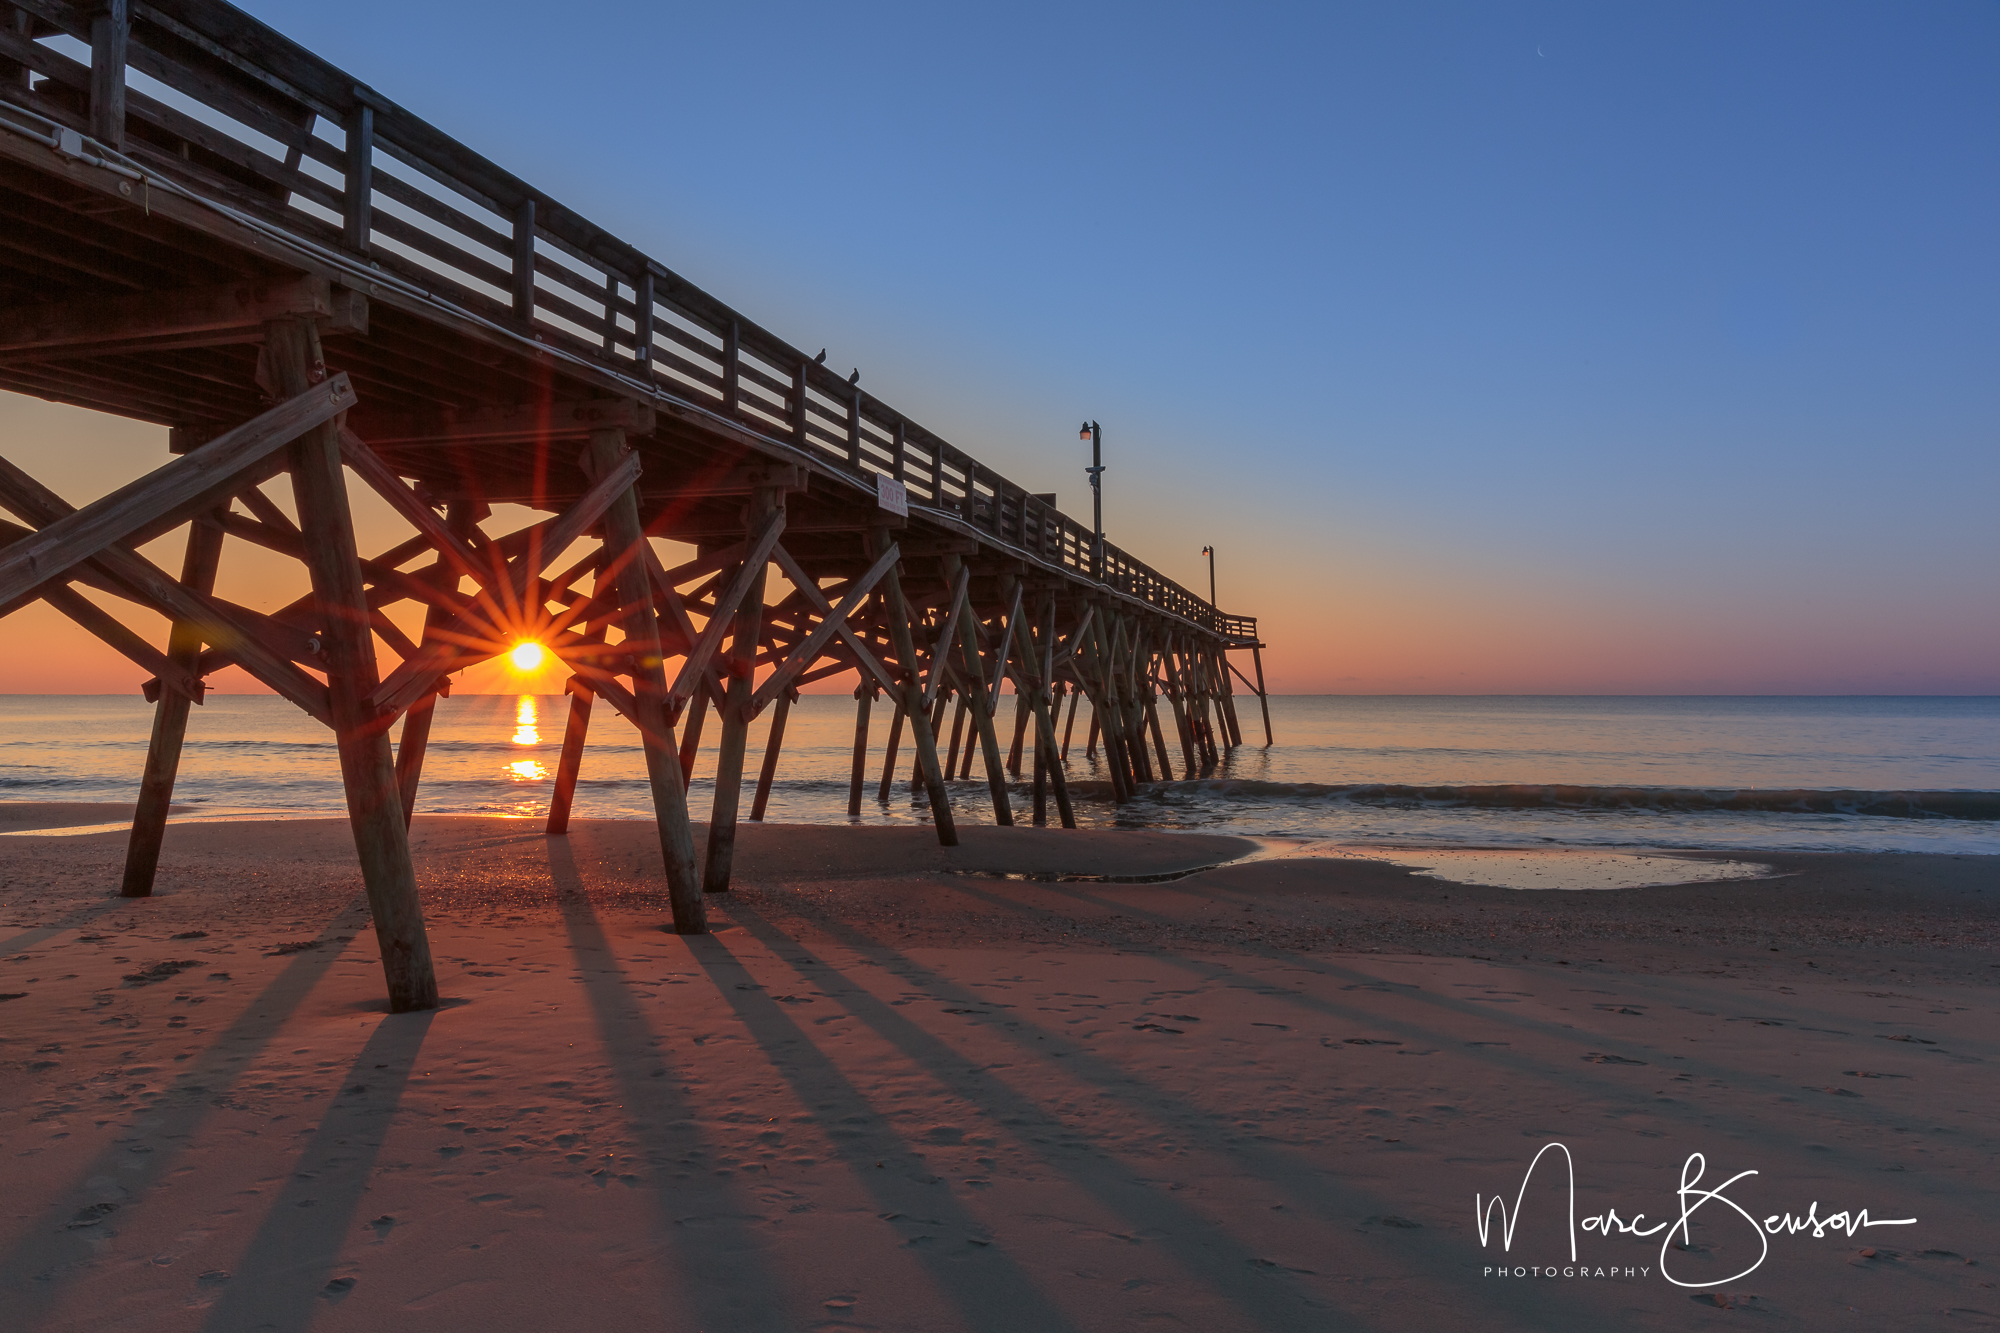 The Pier at Garden City, Myrtle Beach SC, USA